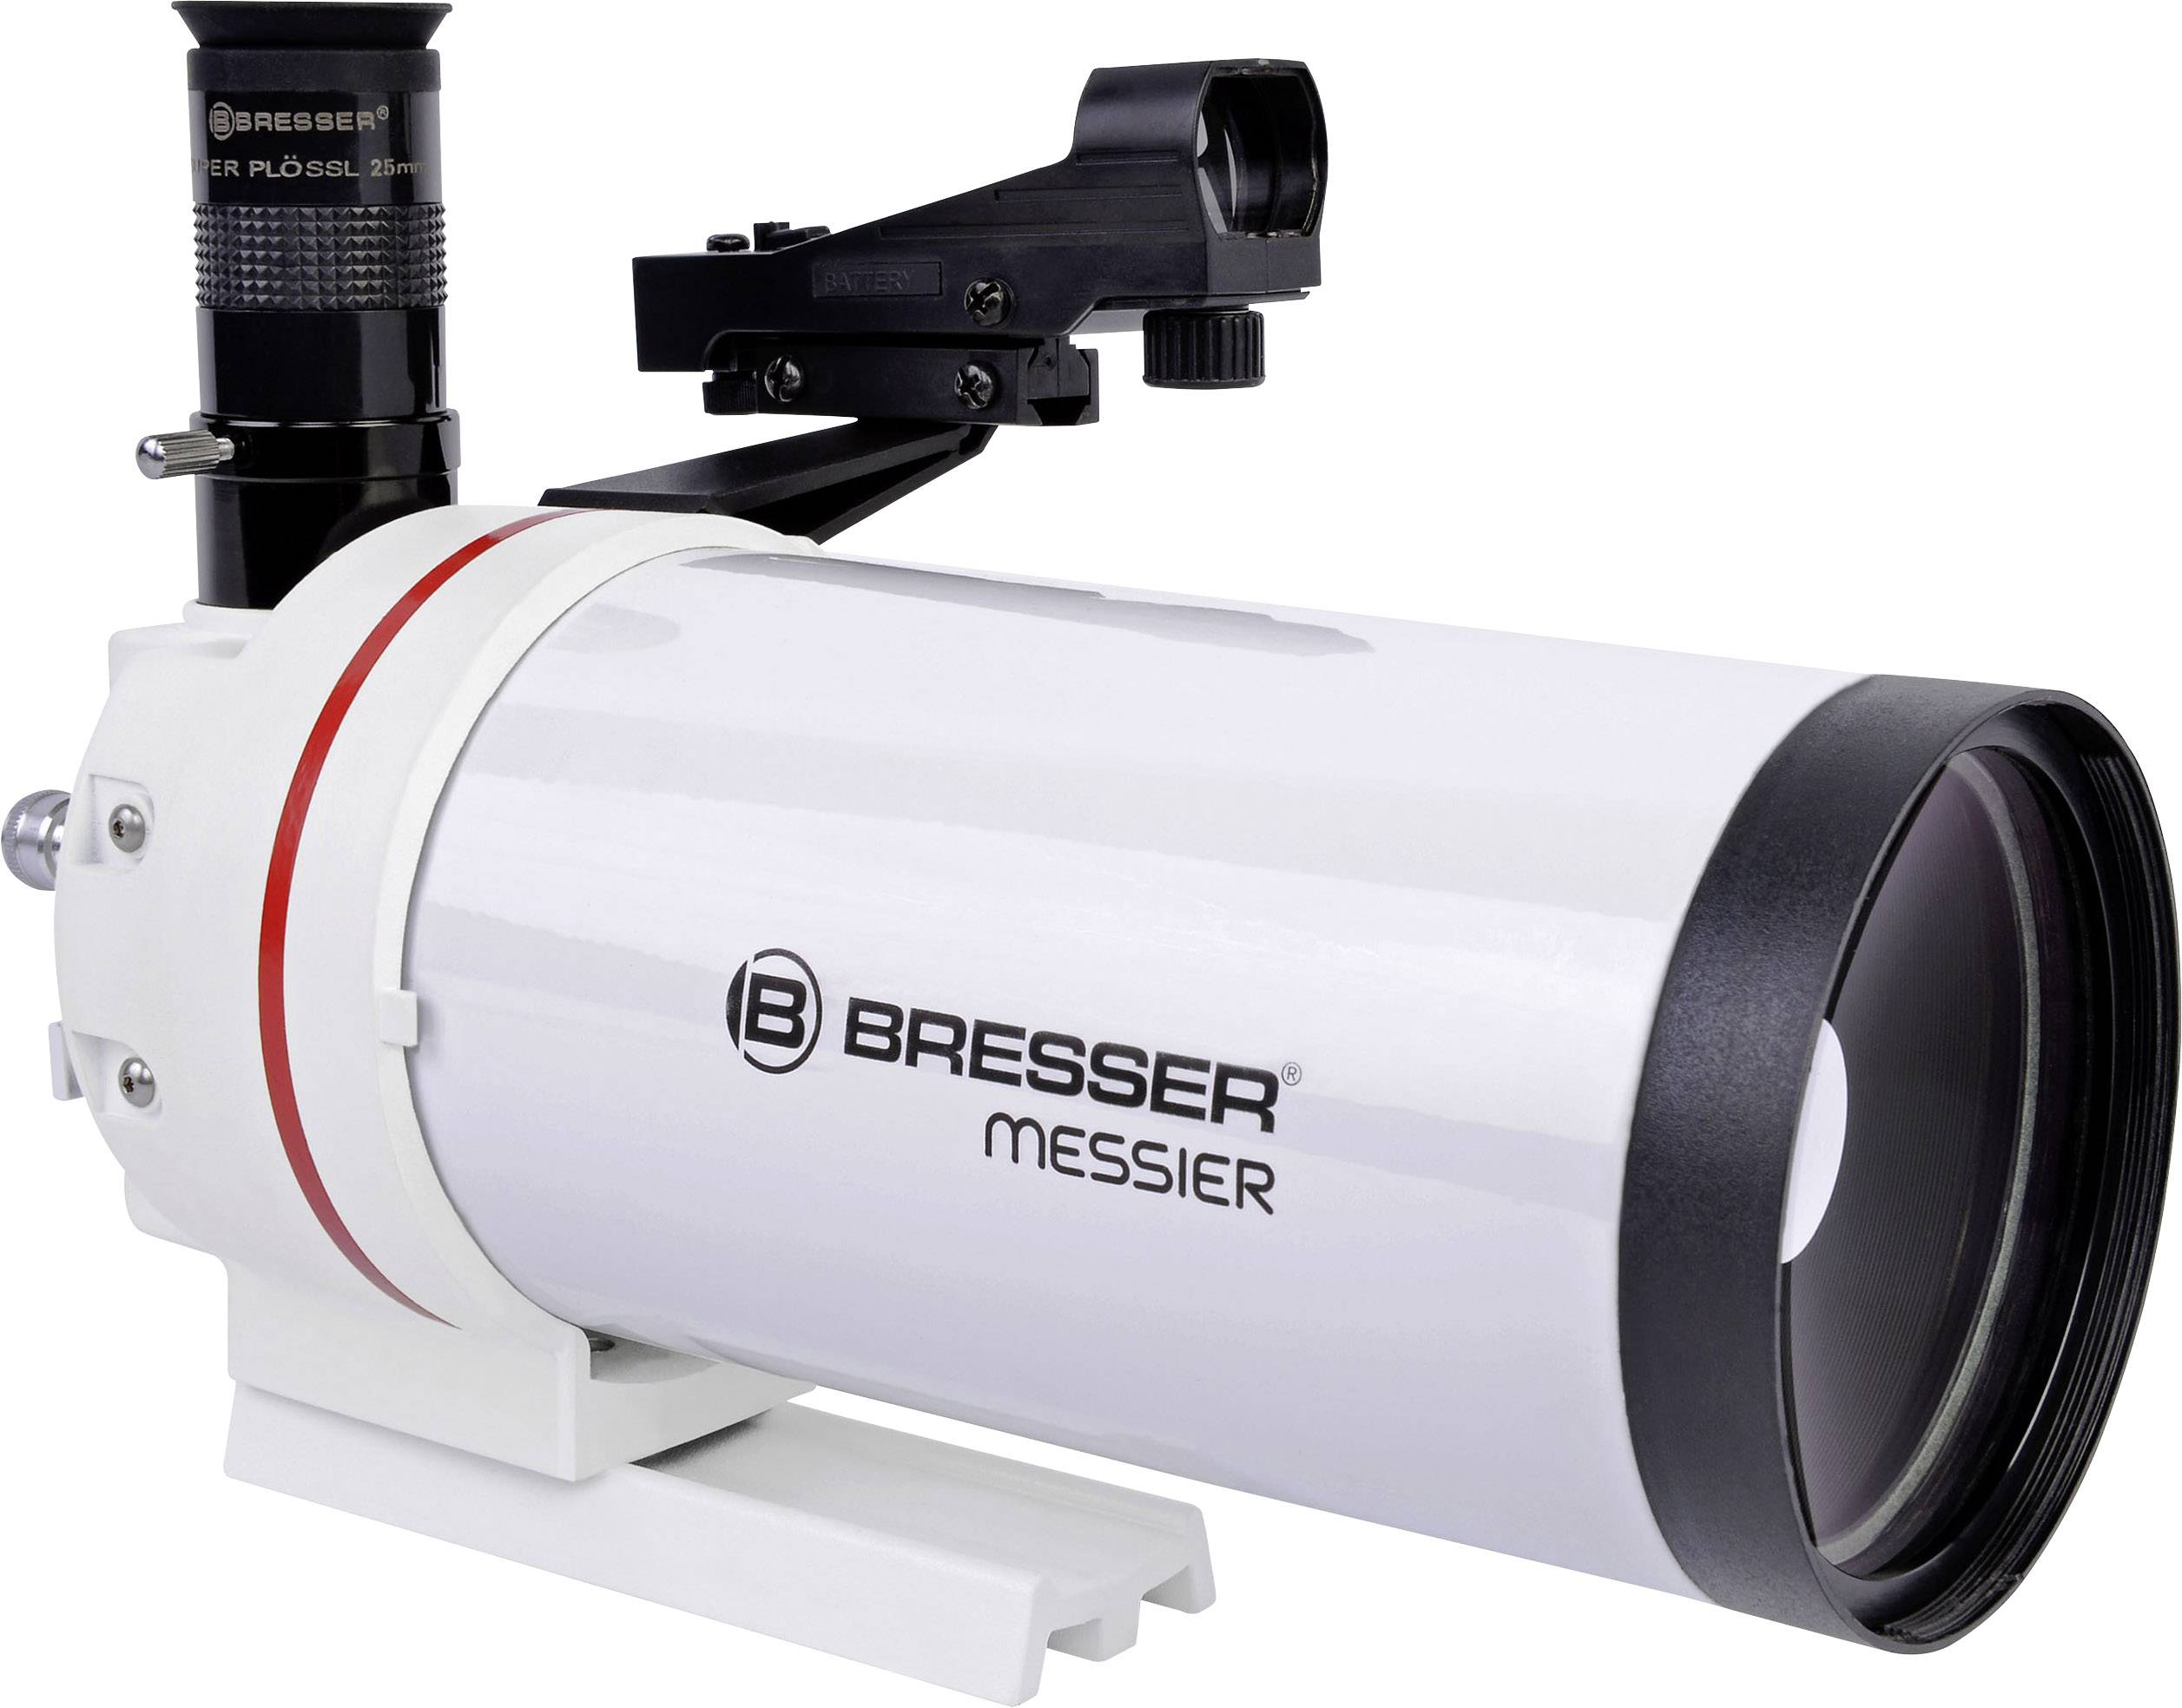 Teleskop express zwo guiding teleskop mm f mini leitrohr